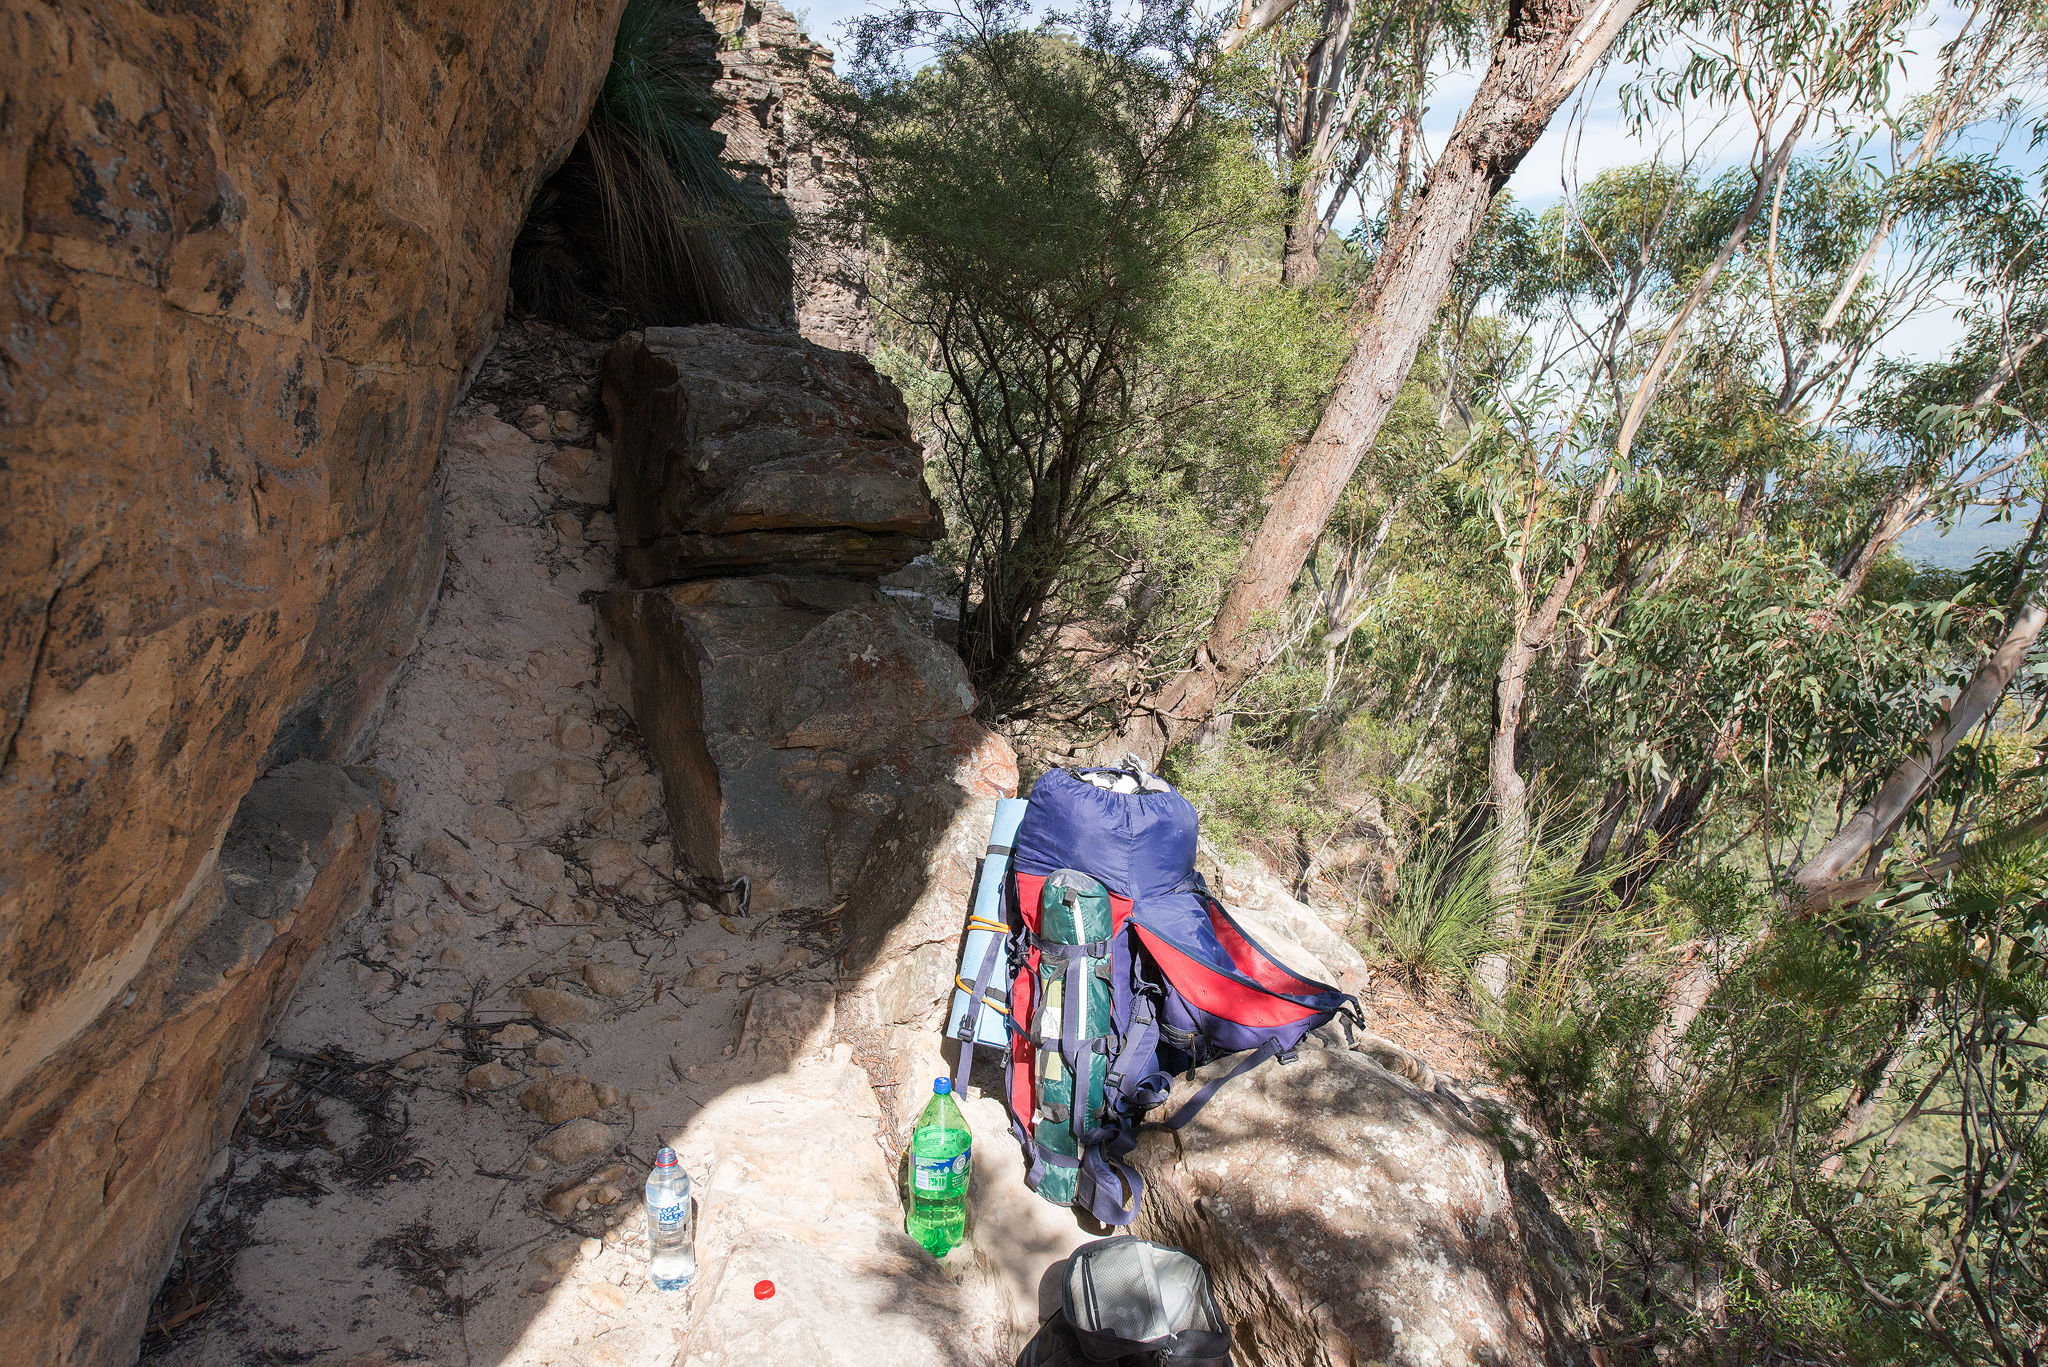 Finding shady spot on the climb